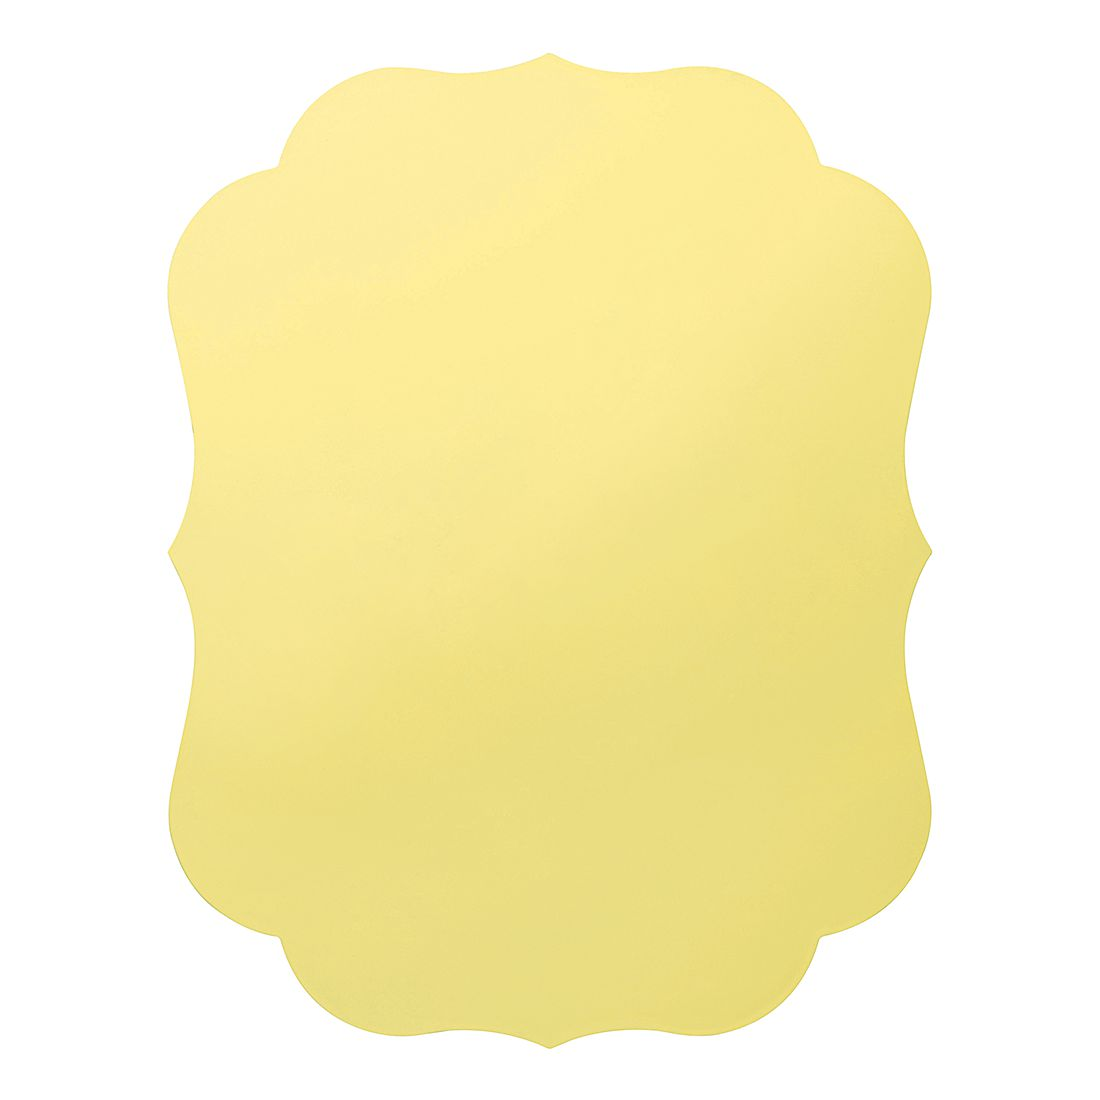 Tischset New Romantic (2er-Set) – Kunststoff – Gelb, BITOSSI HOME günstig bestellen